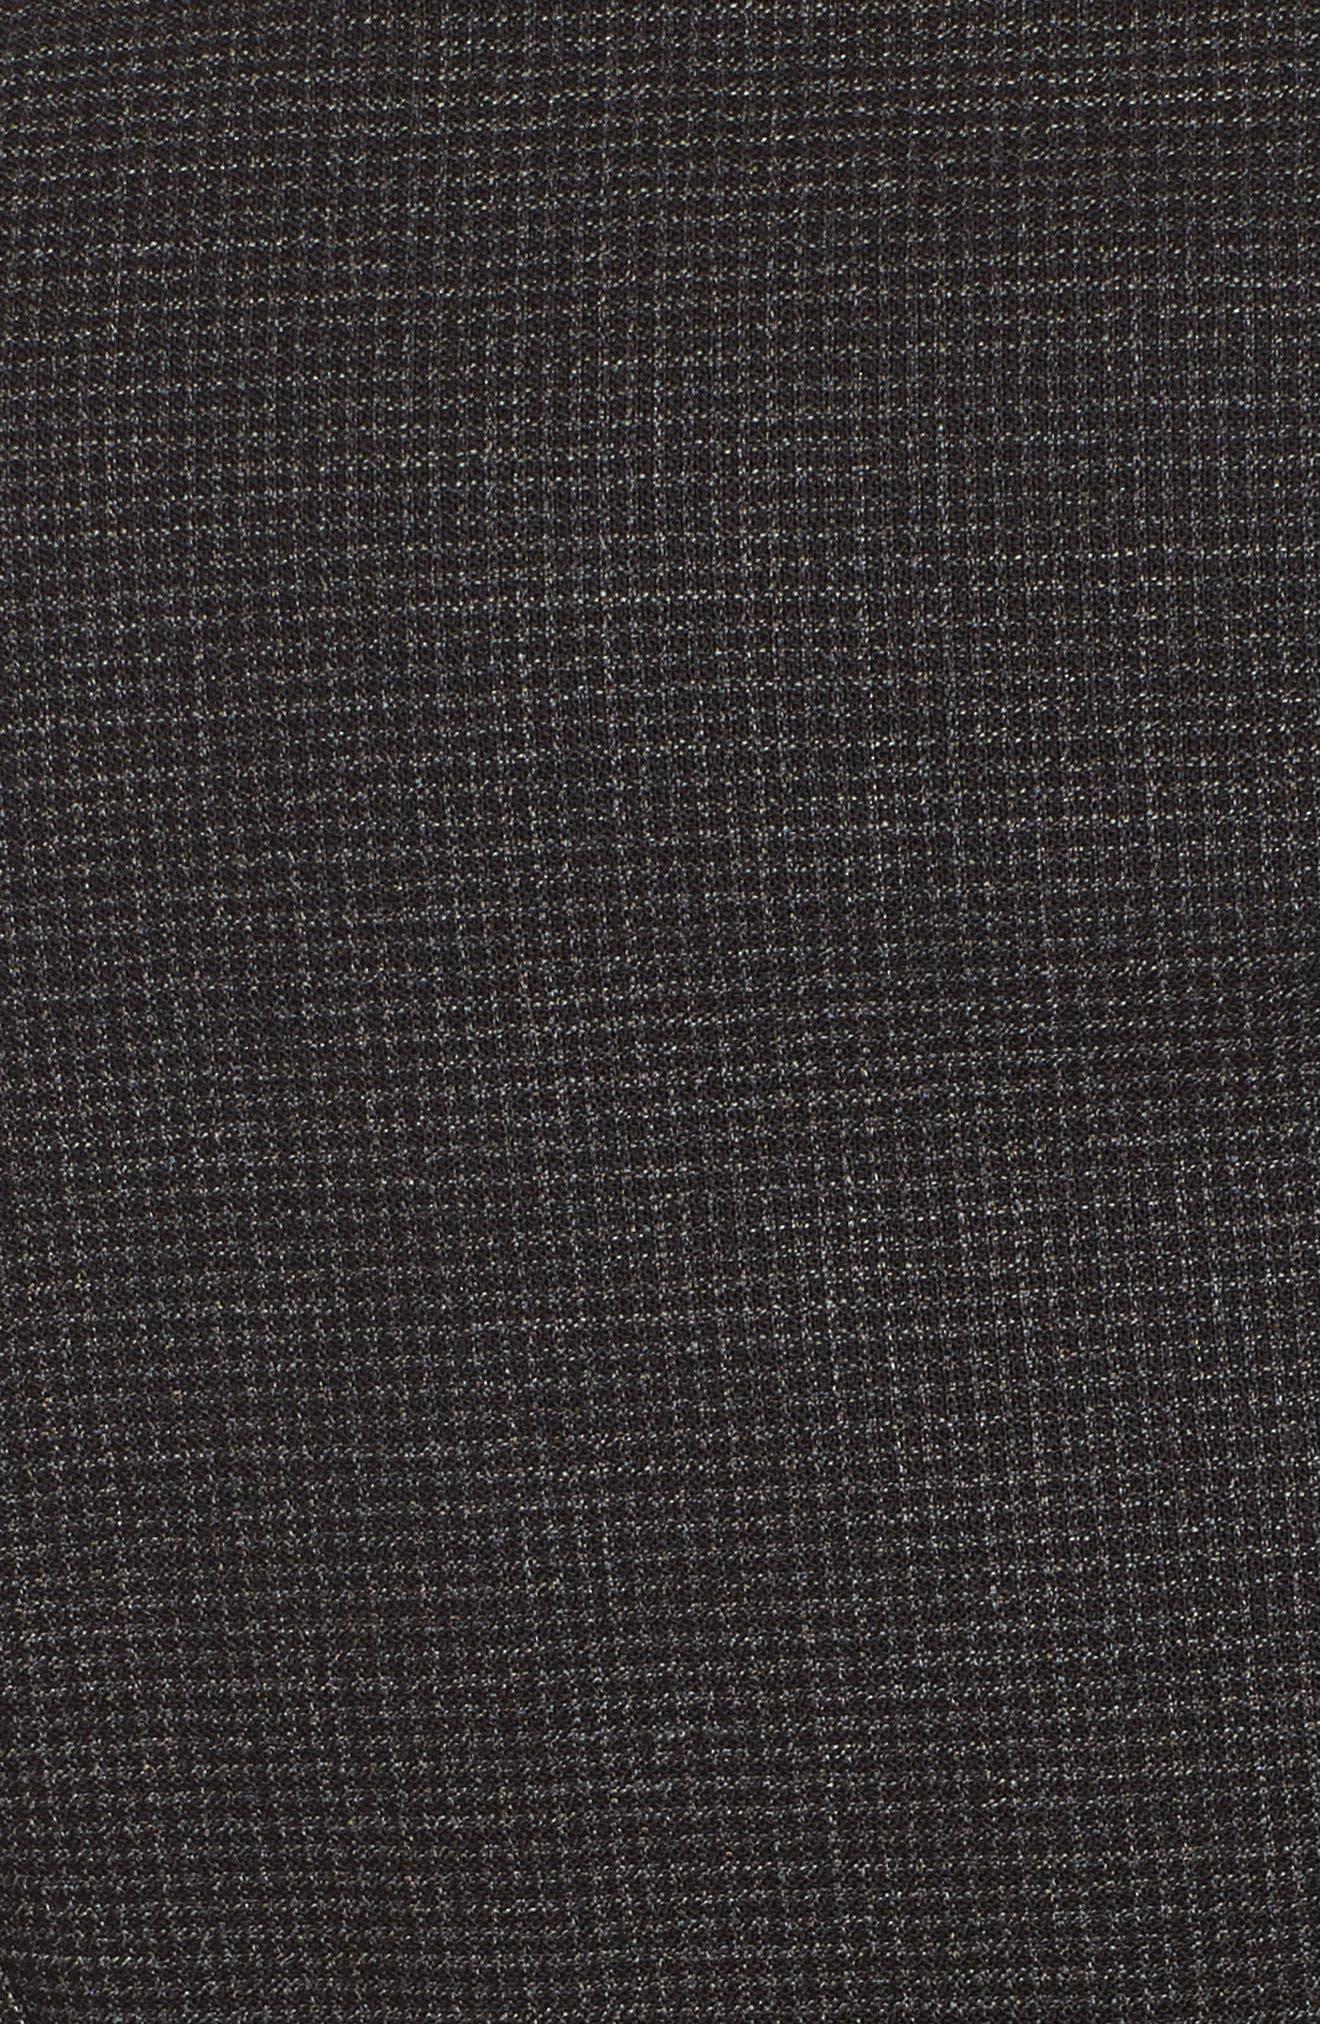 Jewisa Wool Jacket,                             Alternate thumbnail 5, color,                             Black Fantasy